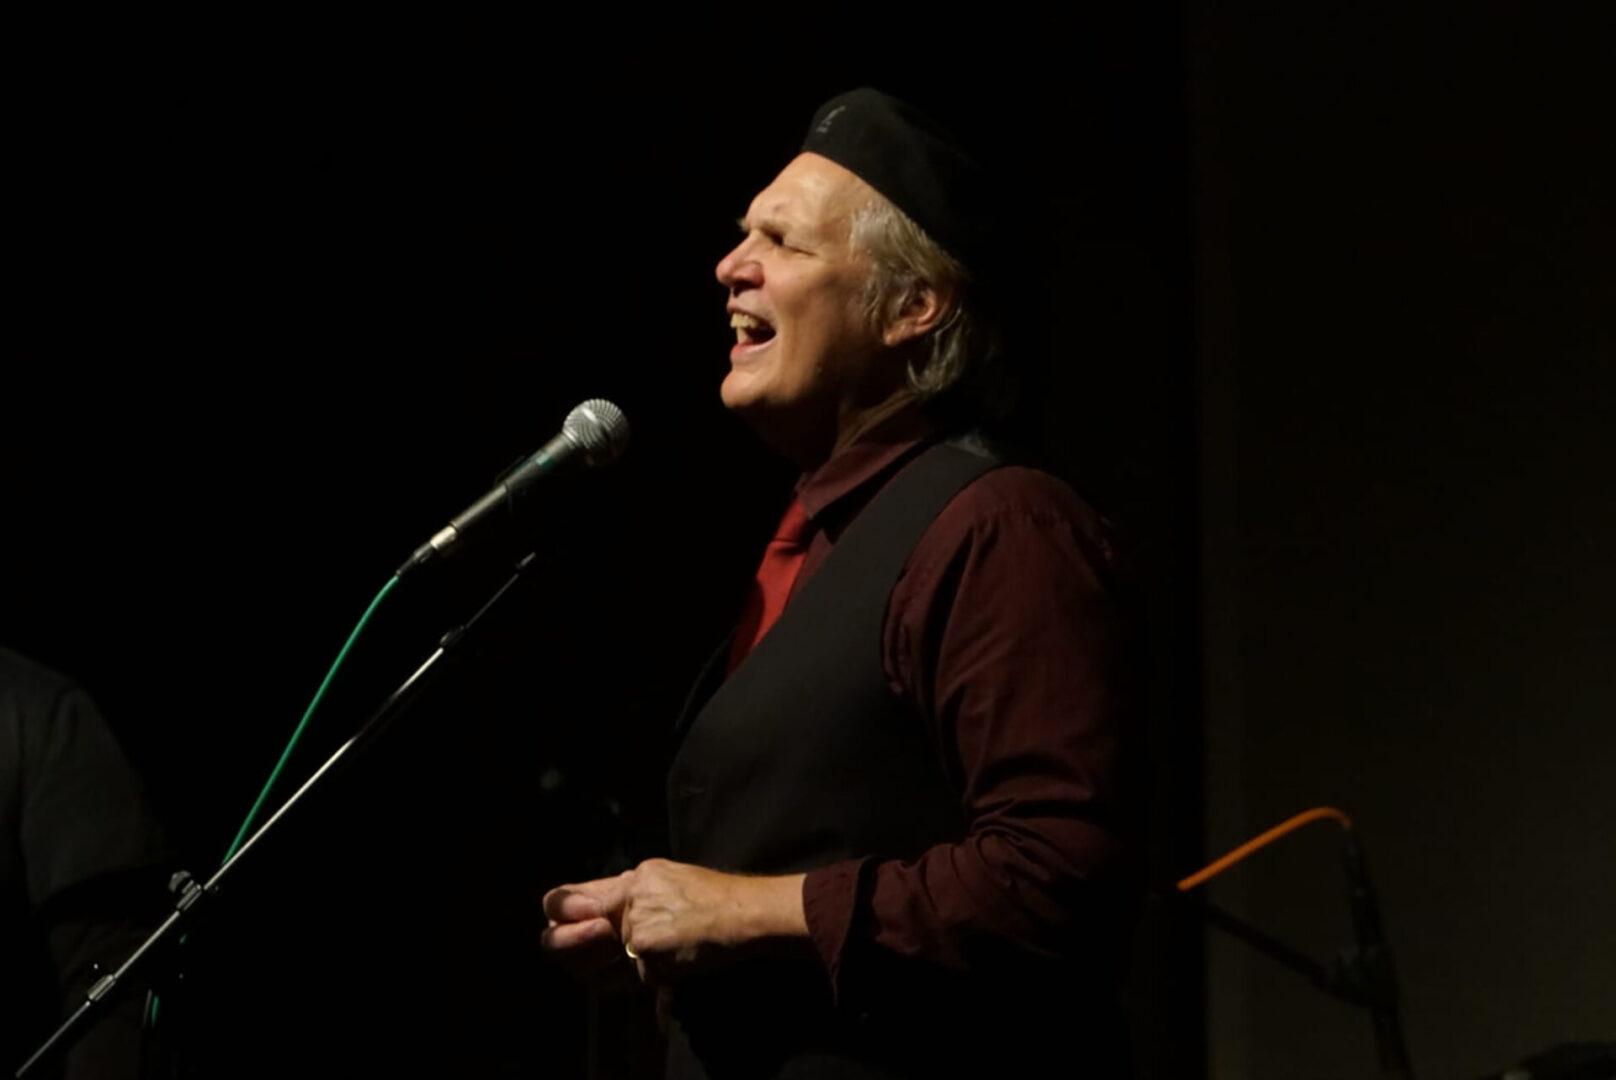 Greg Greenway singing through a microphone